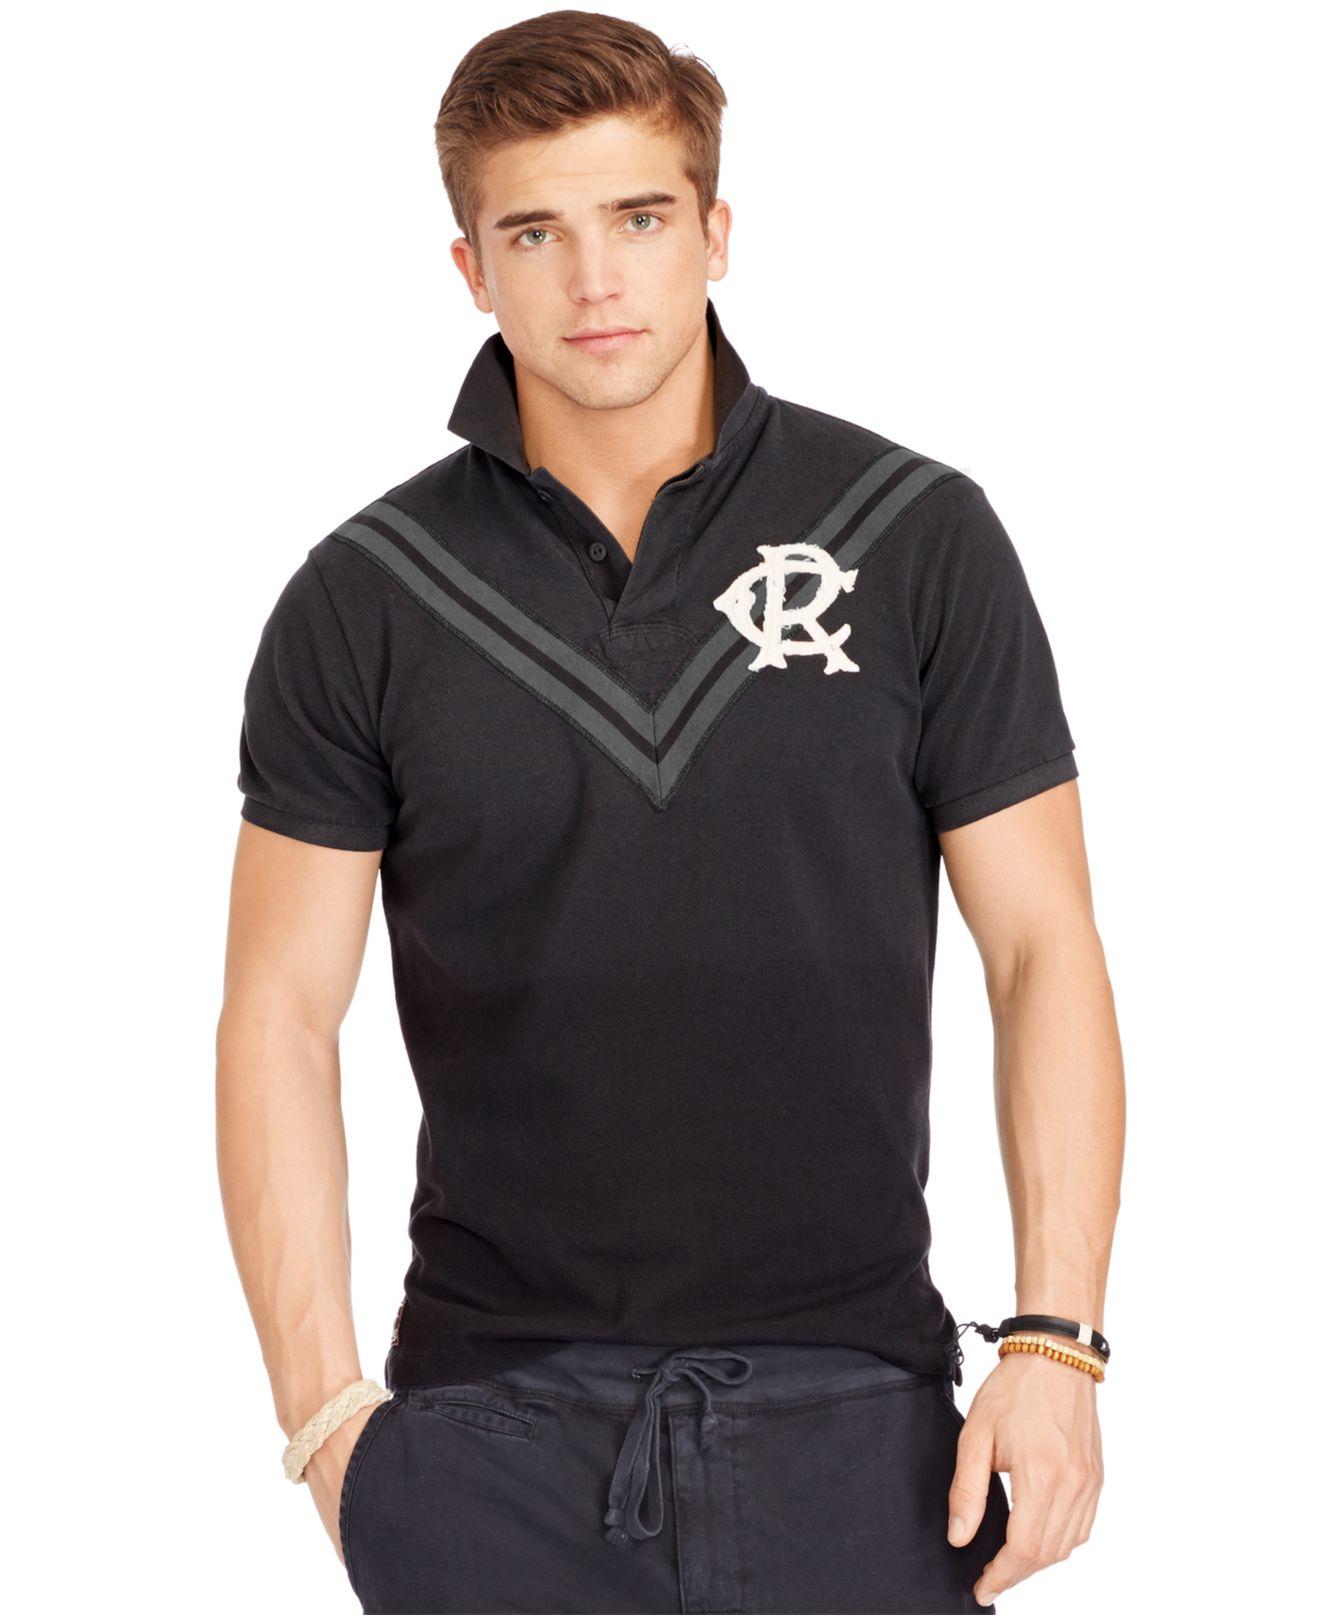 Lyst polo ralph lauren custom fit chevron mesh rugby for Polo ralph lauren custom fit polo shirt